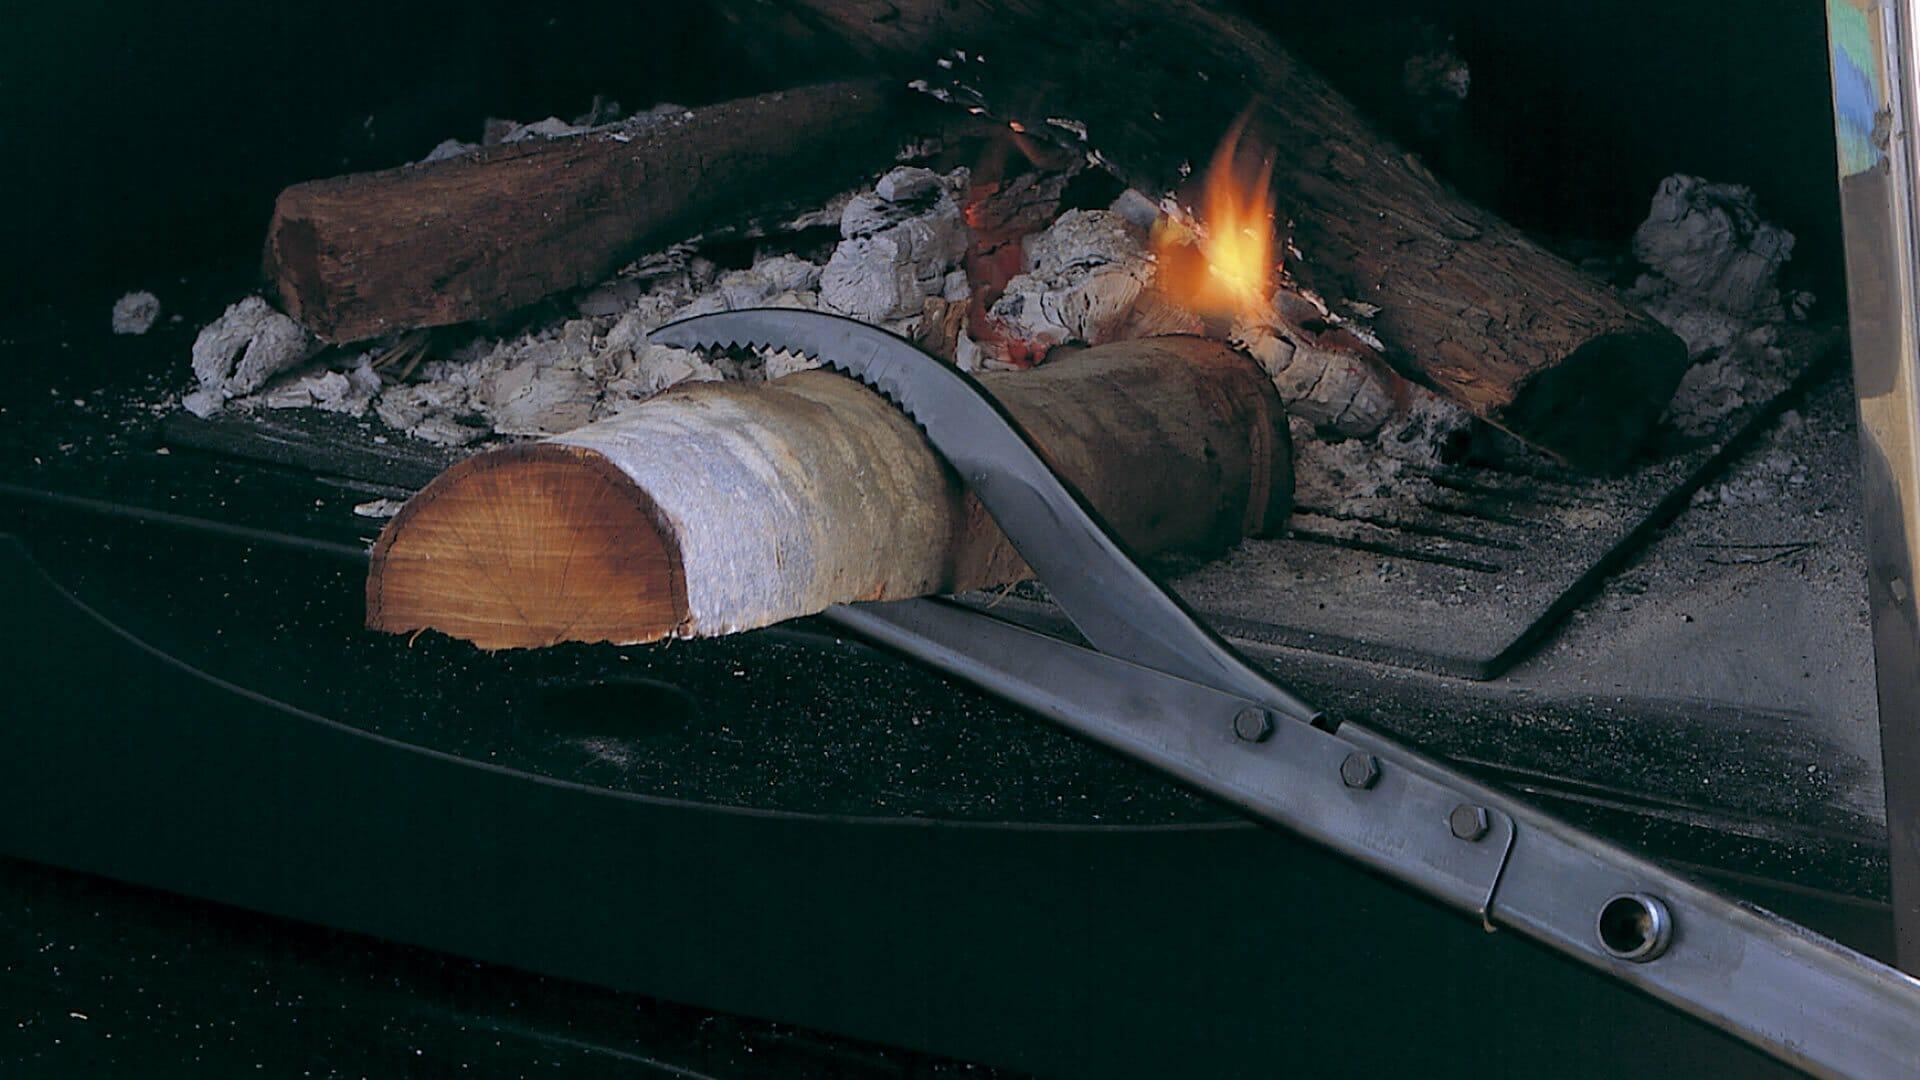 Pinza Eina sujetando tronco ardiendo